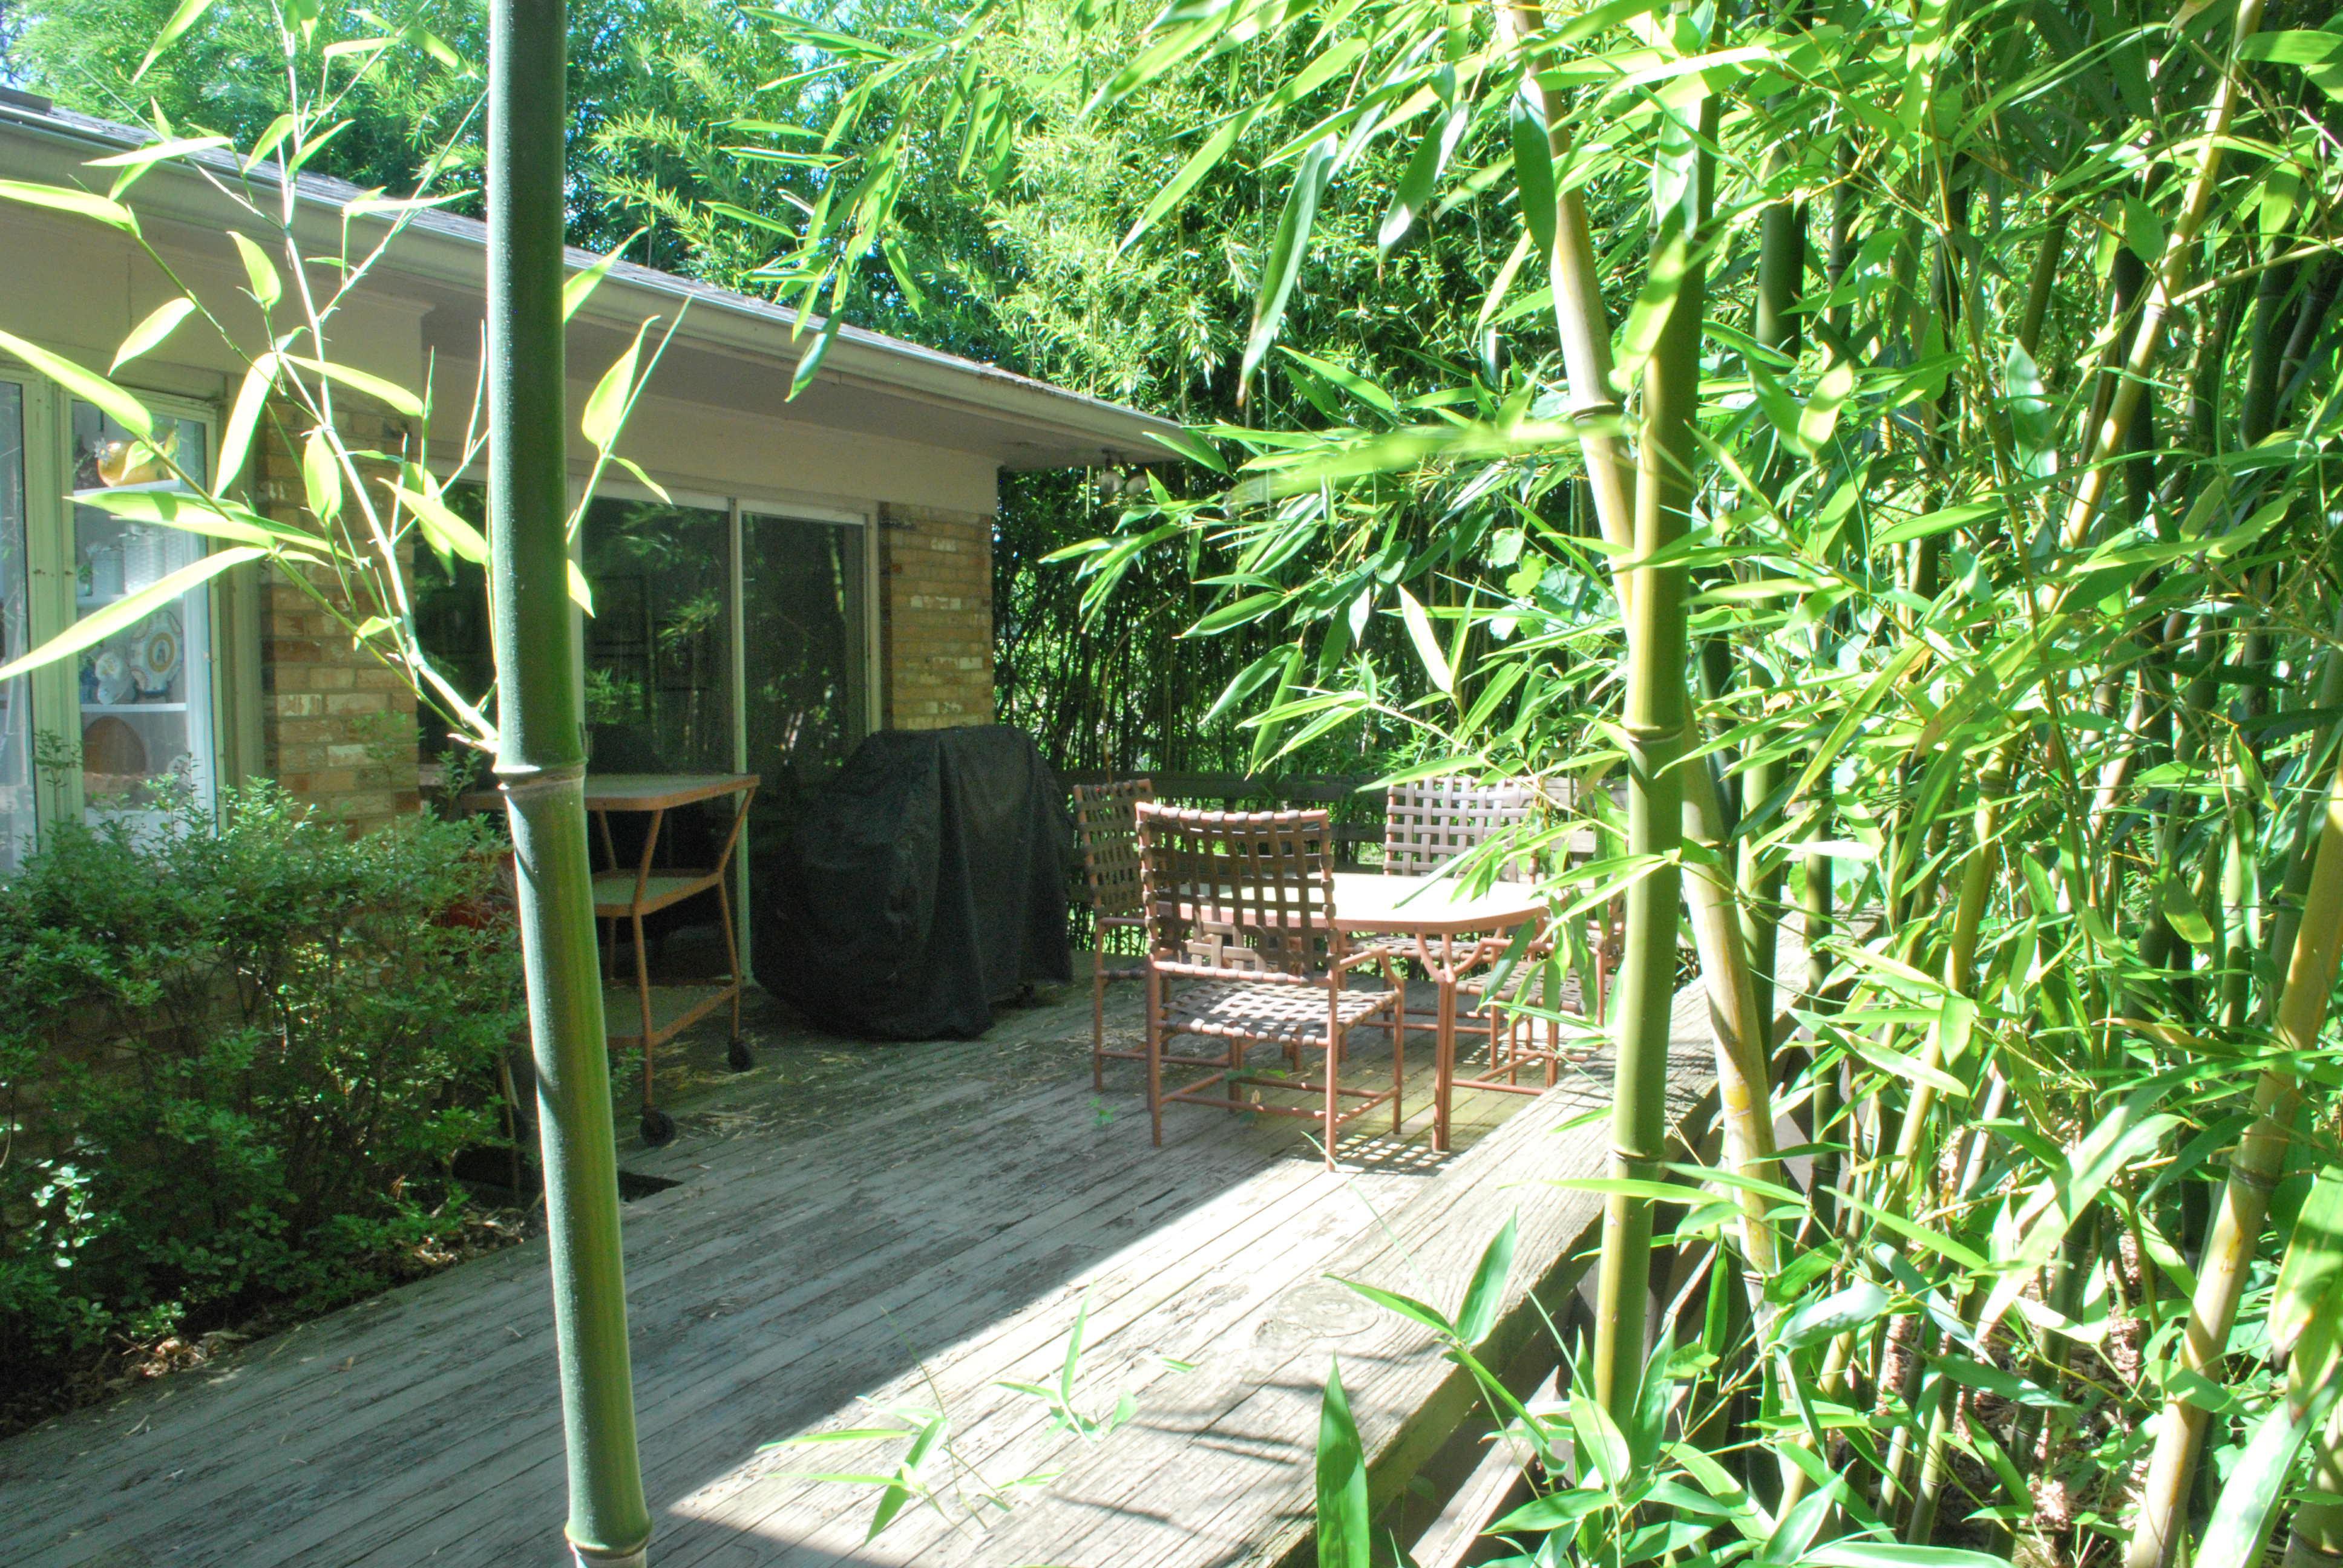 Backyard Deck with Plants   Invasive Bamboo Species